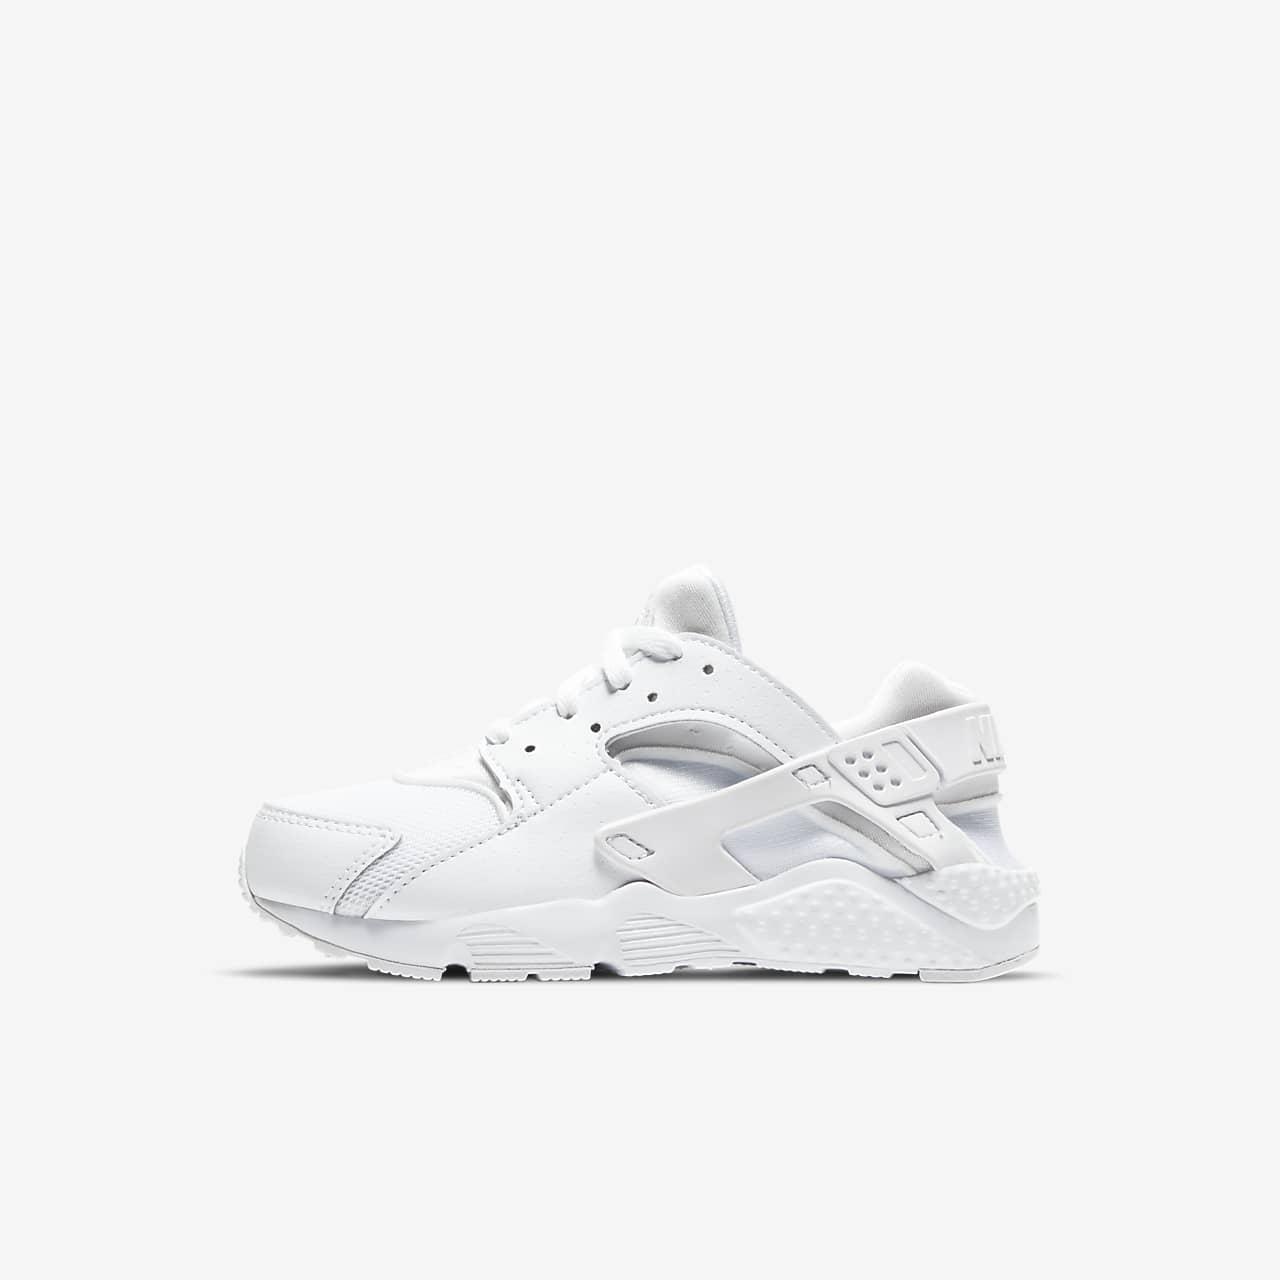 60121cd420b Nike Huarache Little Kids  Shoe. Nike.com